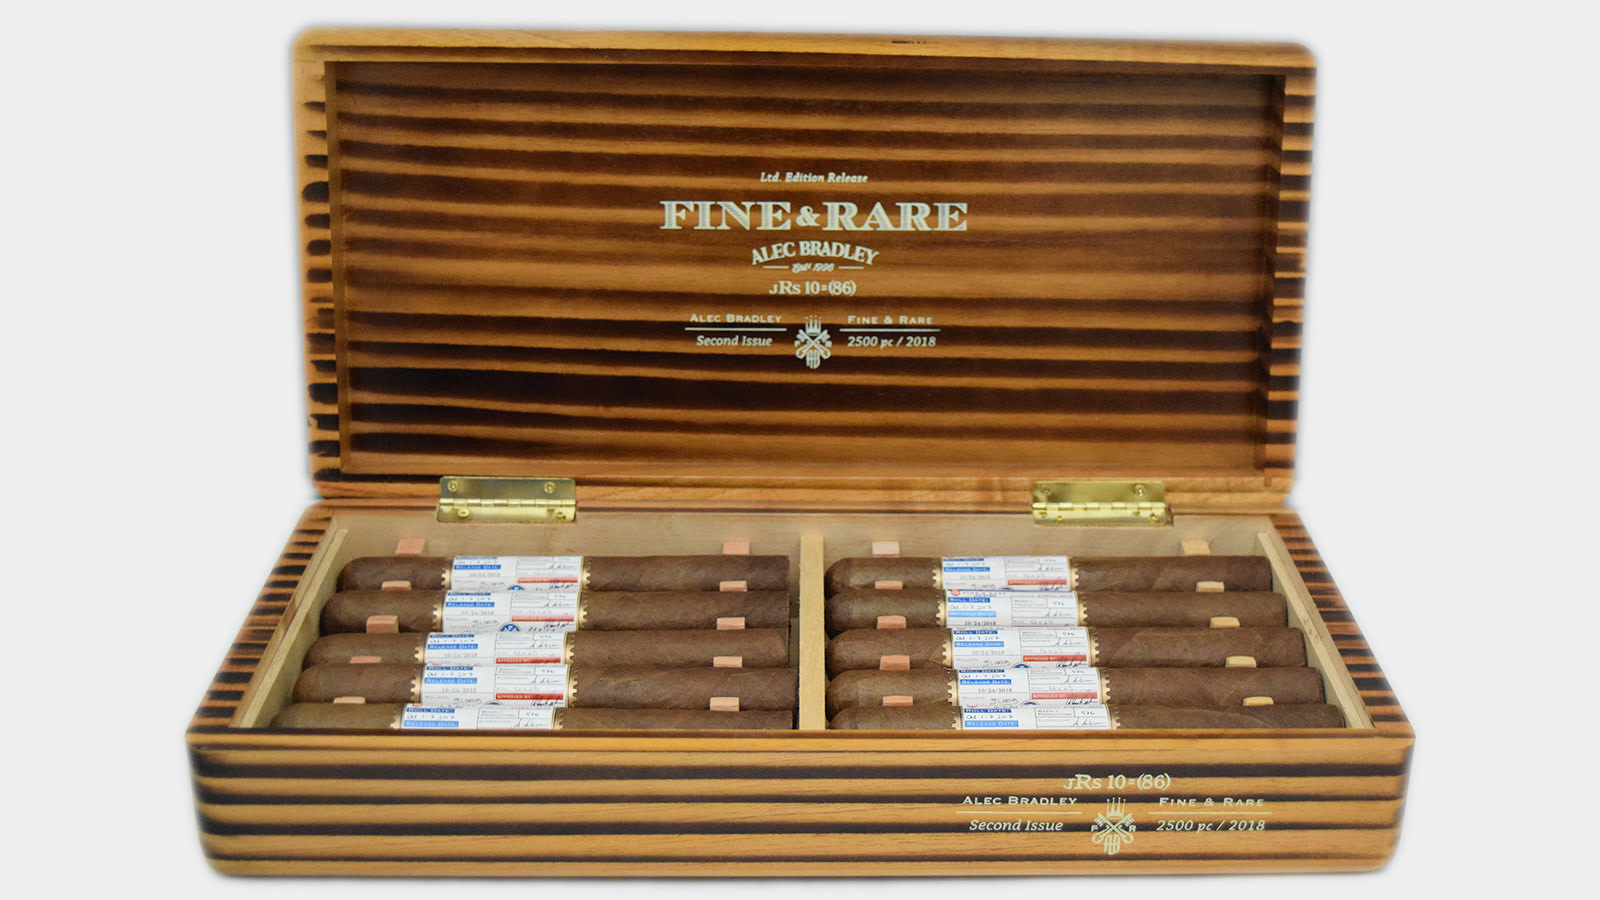 Alec Bradley Cigar Co. ALEC BRADLEY FINE AND RARE 2019 6.25x54 single